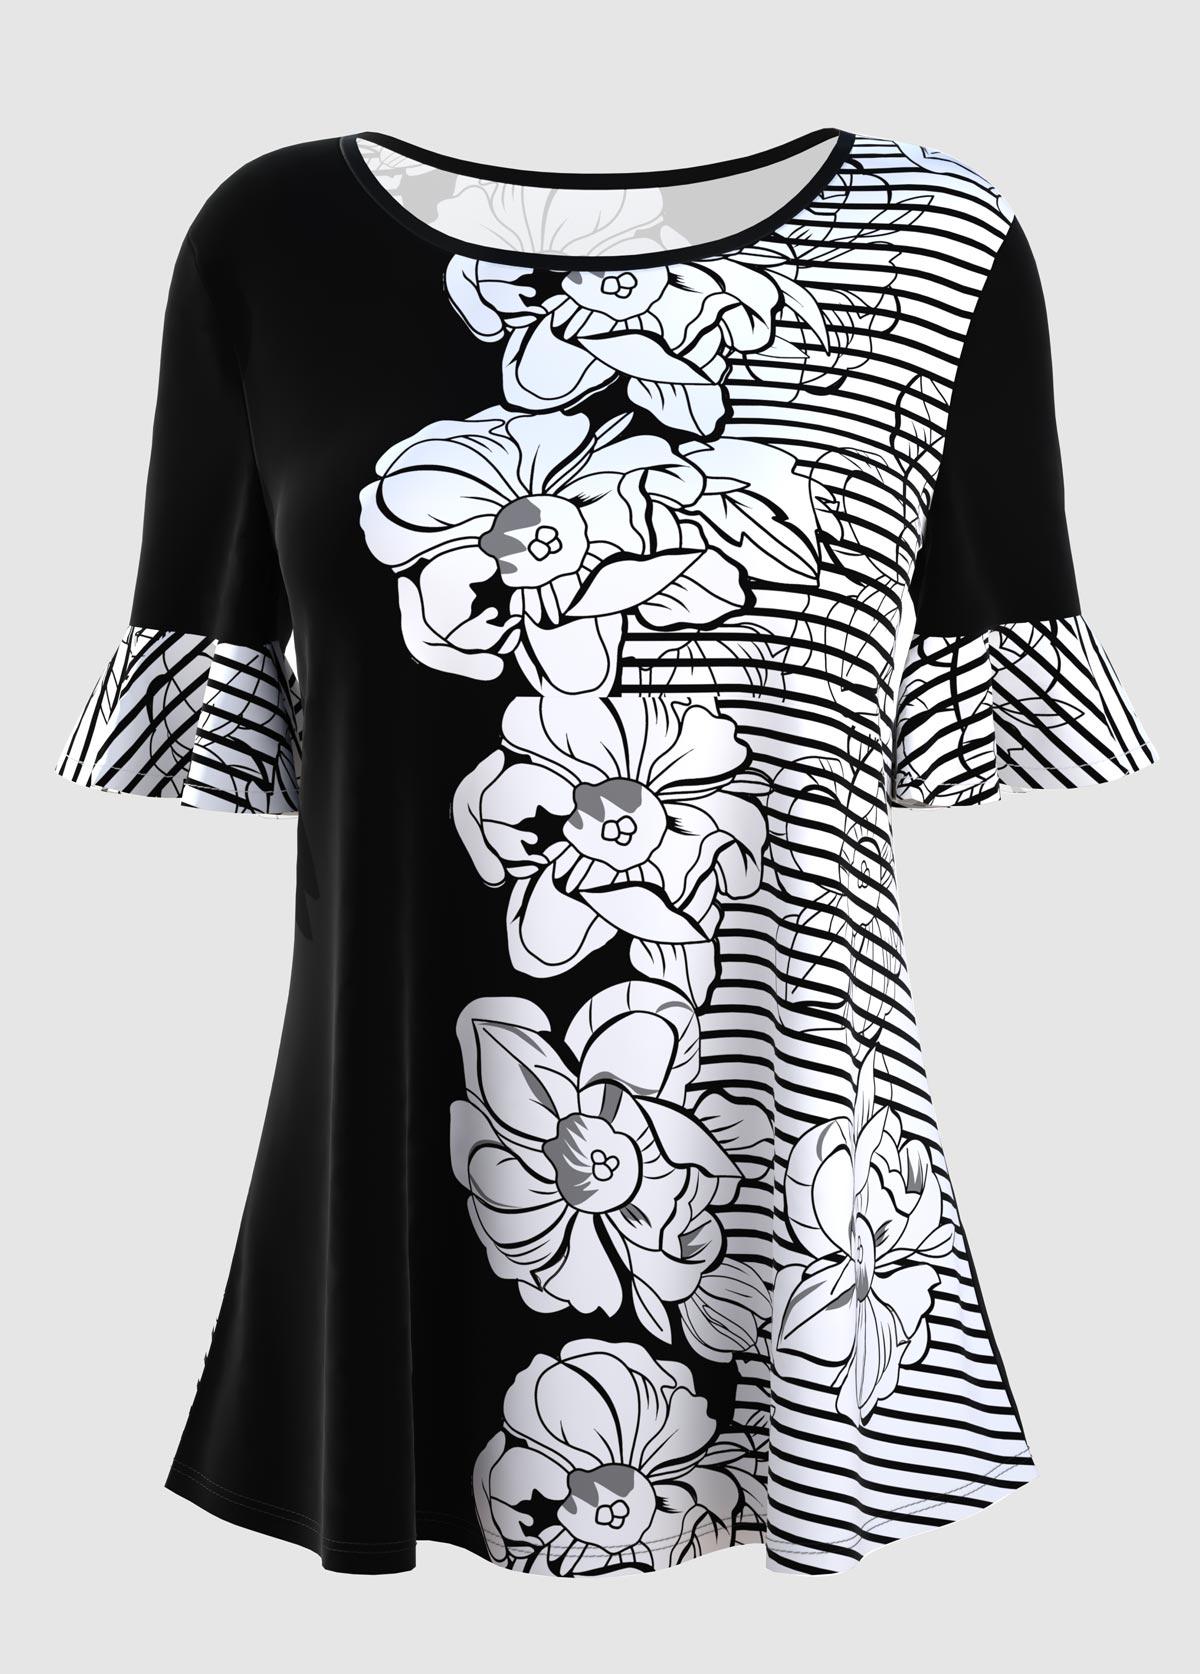 ROTITA Round Neck Stripe and Floral Print Short Sleeve T Shirt